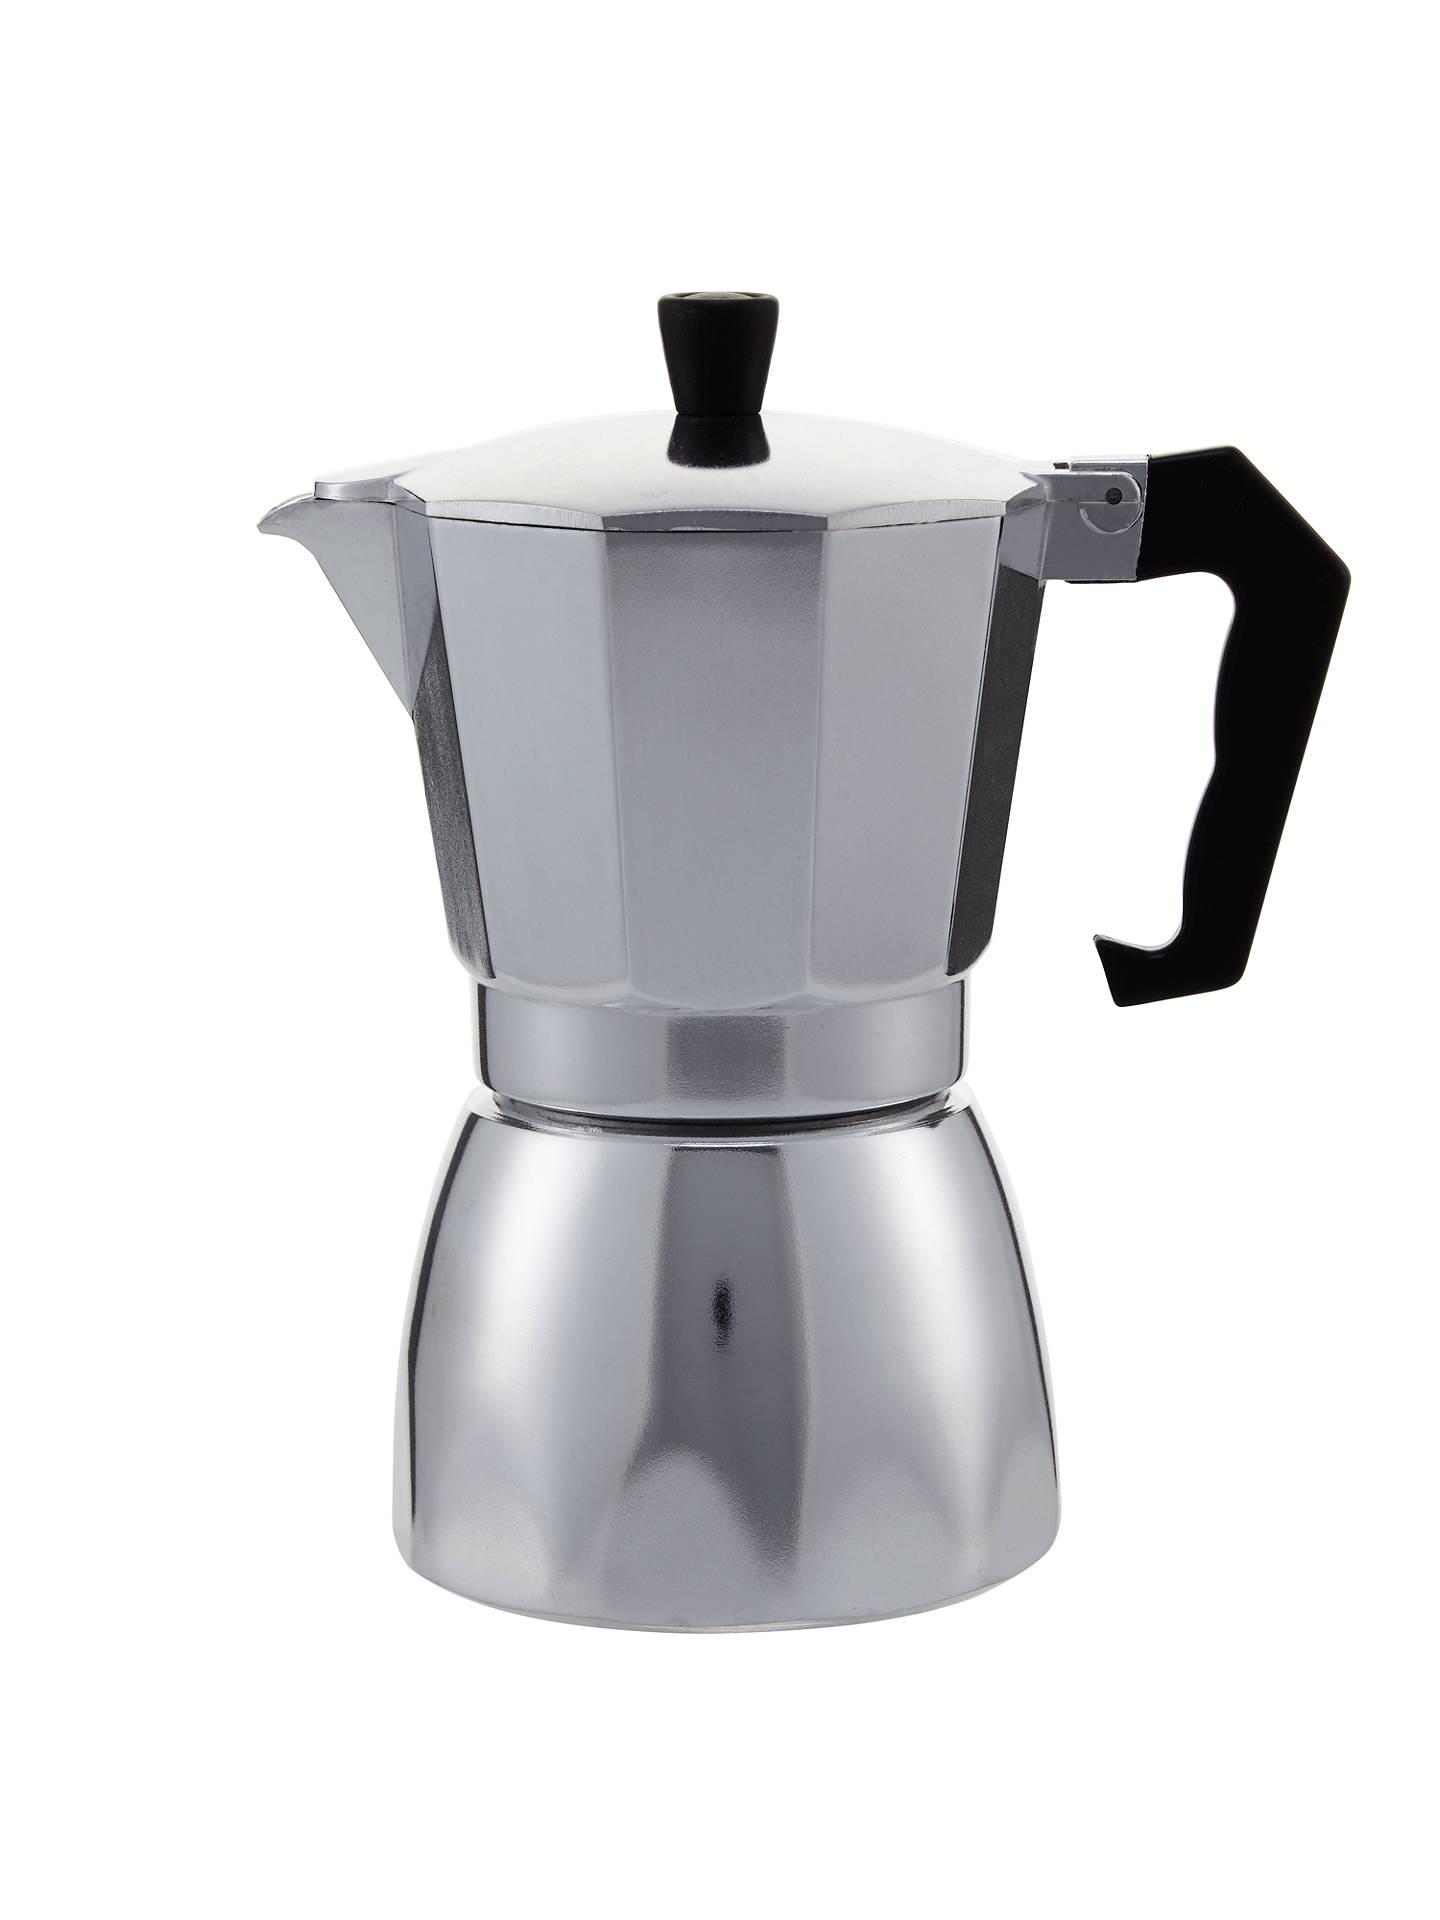 John Lewis Partners Espresso Silver Cafetiere 6 Cup